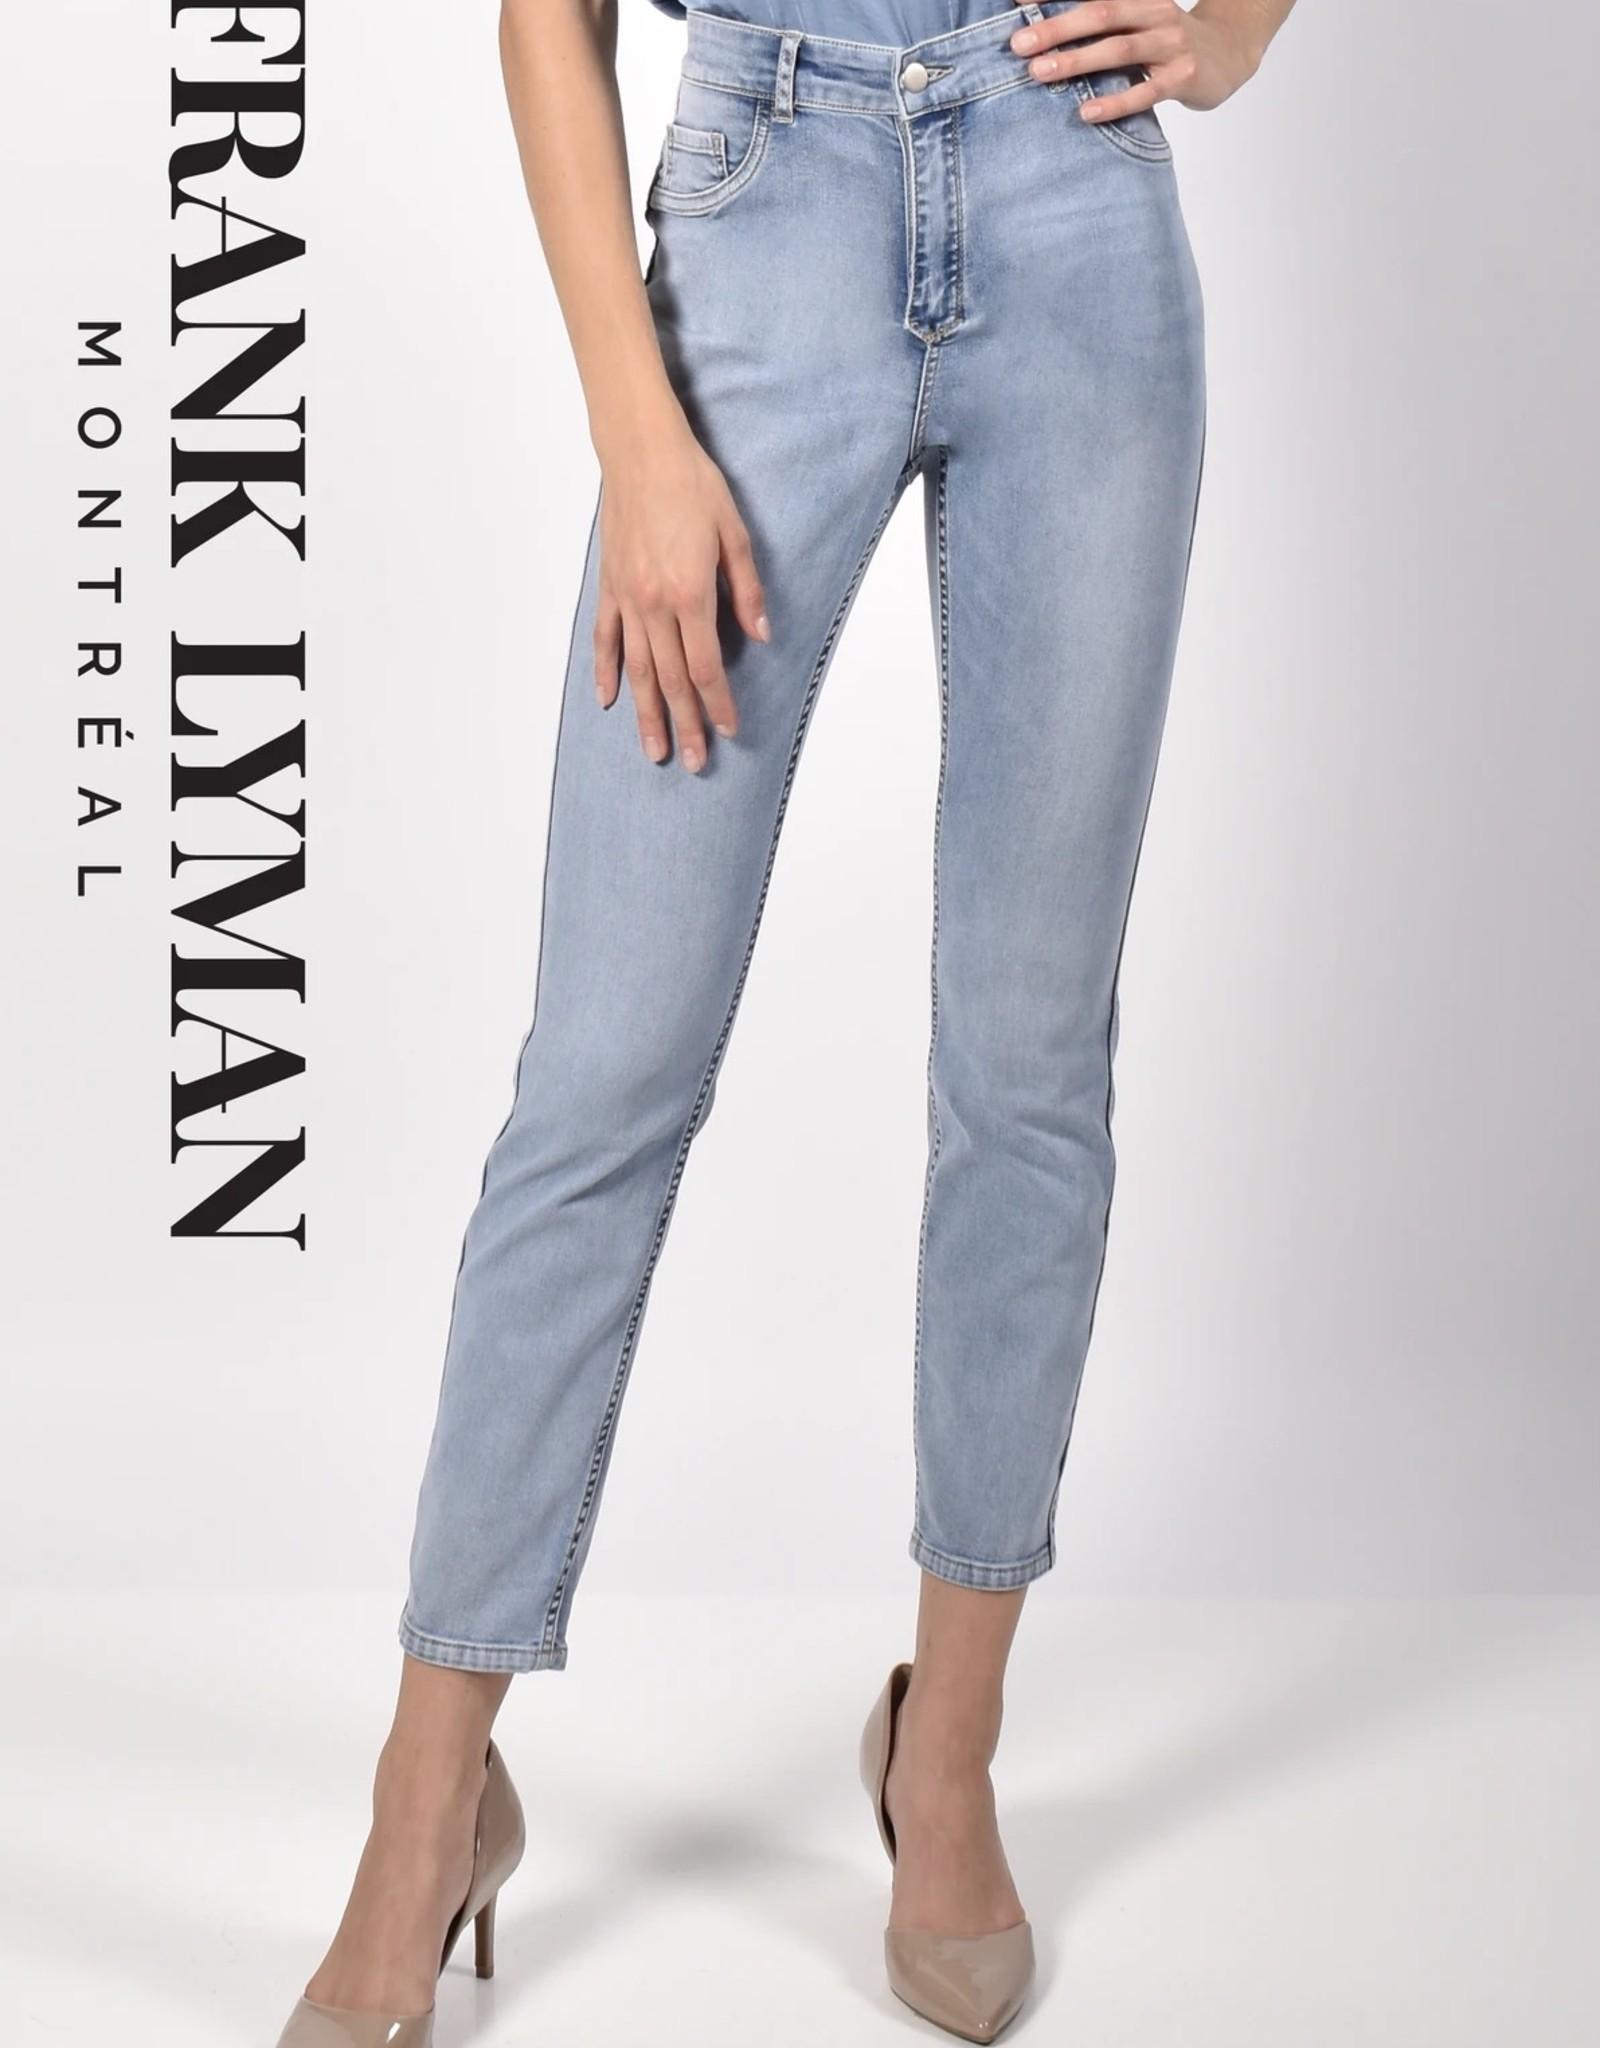 Frank Lyman Frank Lyman 216102U Reversible Denim Pant